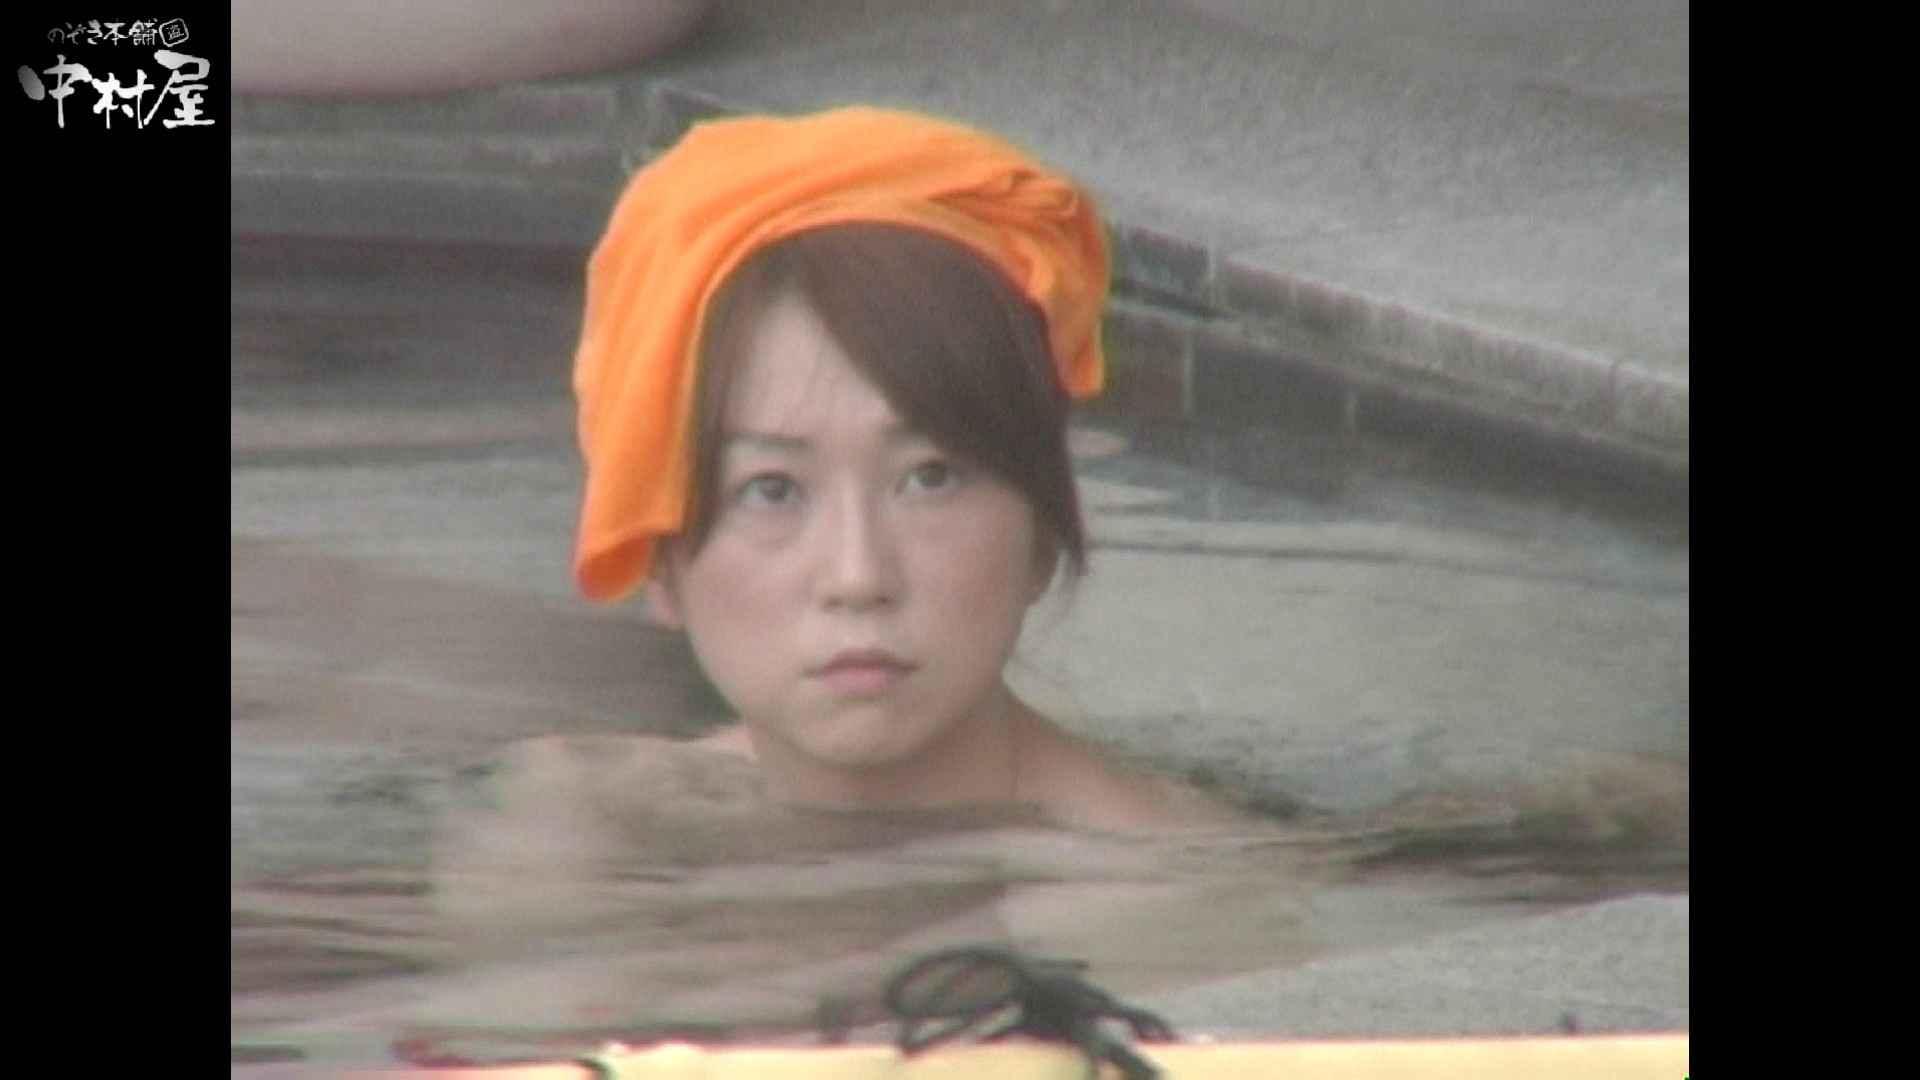 Aquaな露天風呂Vol.941 盗撮師作品  76pic 54